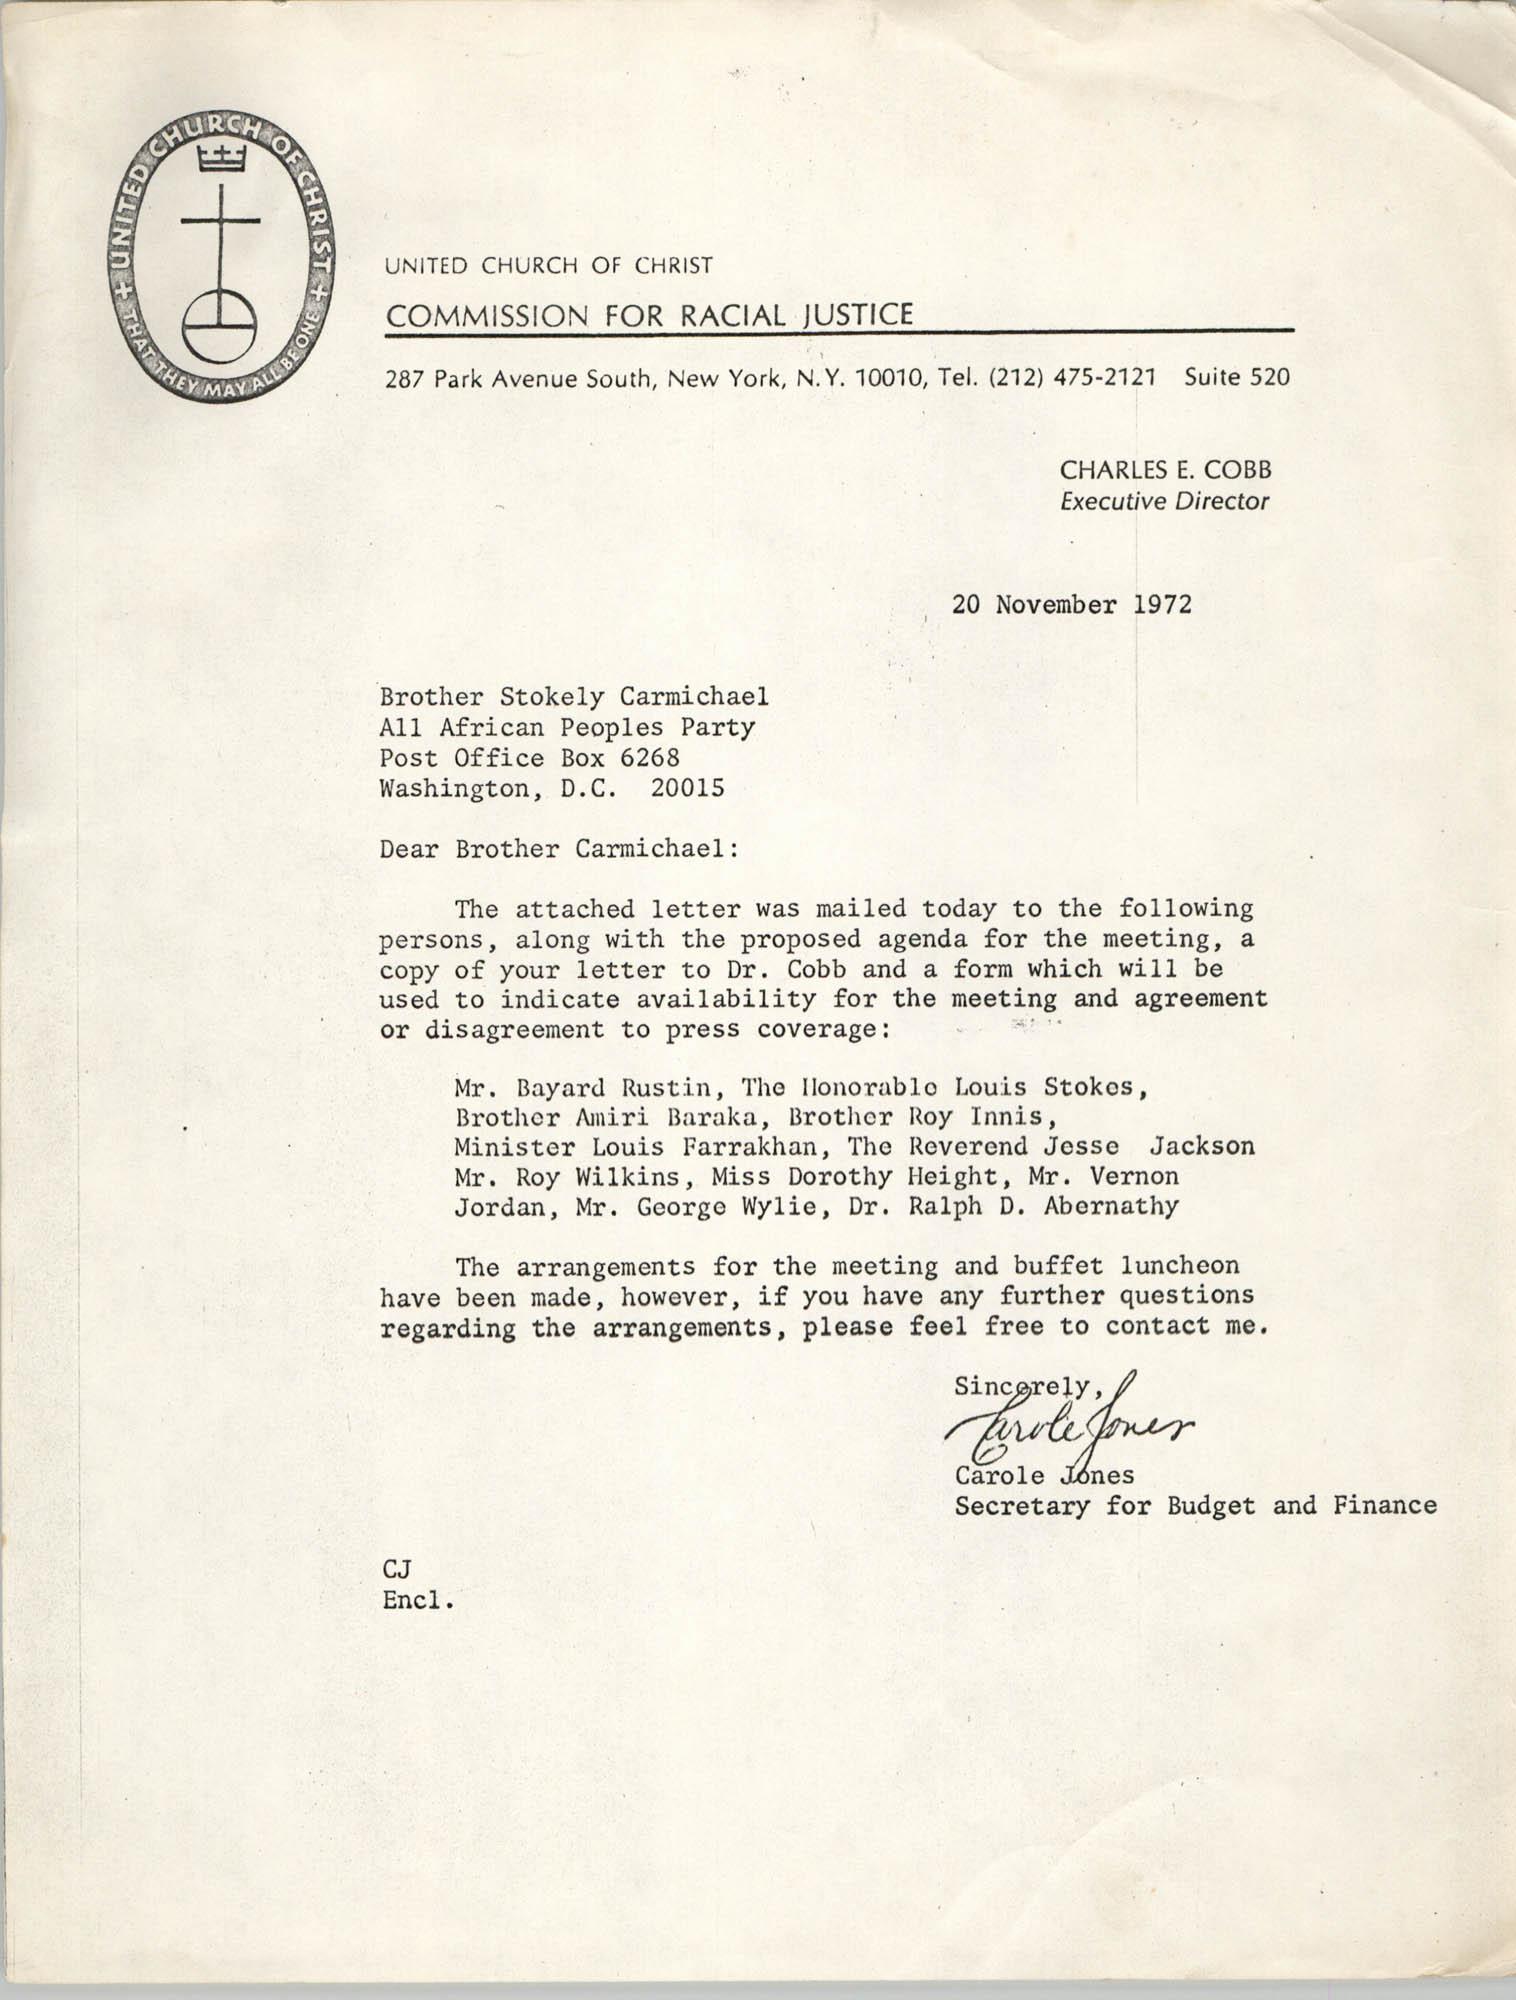 Letter from Carole Jones to Stokely Carmichael, November 20, 1972